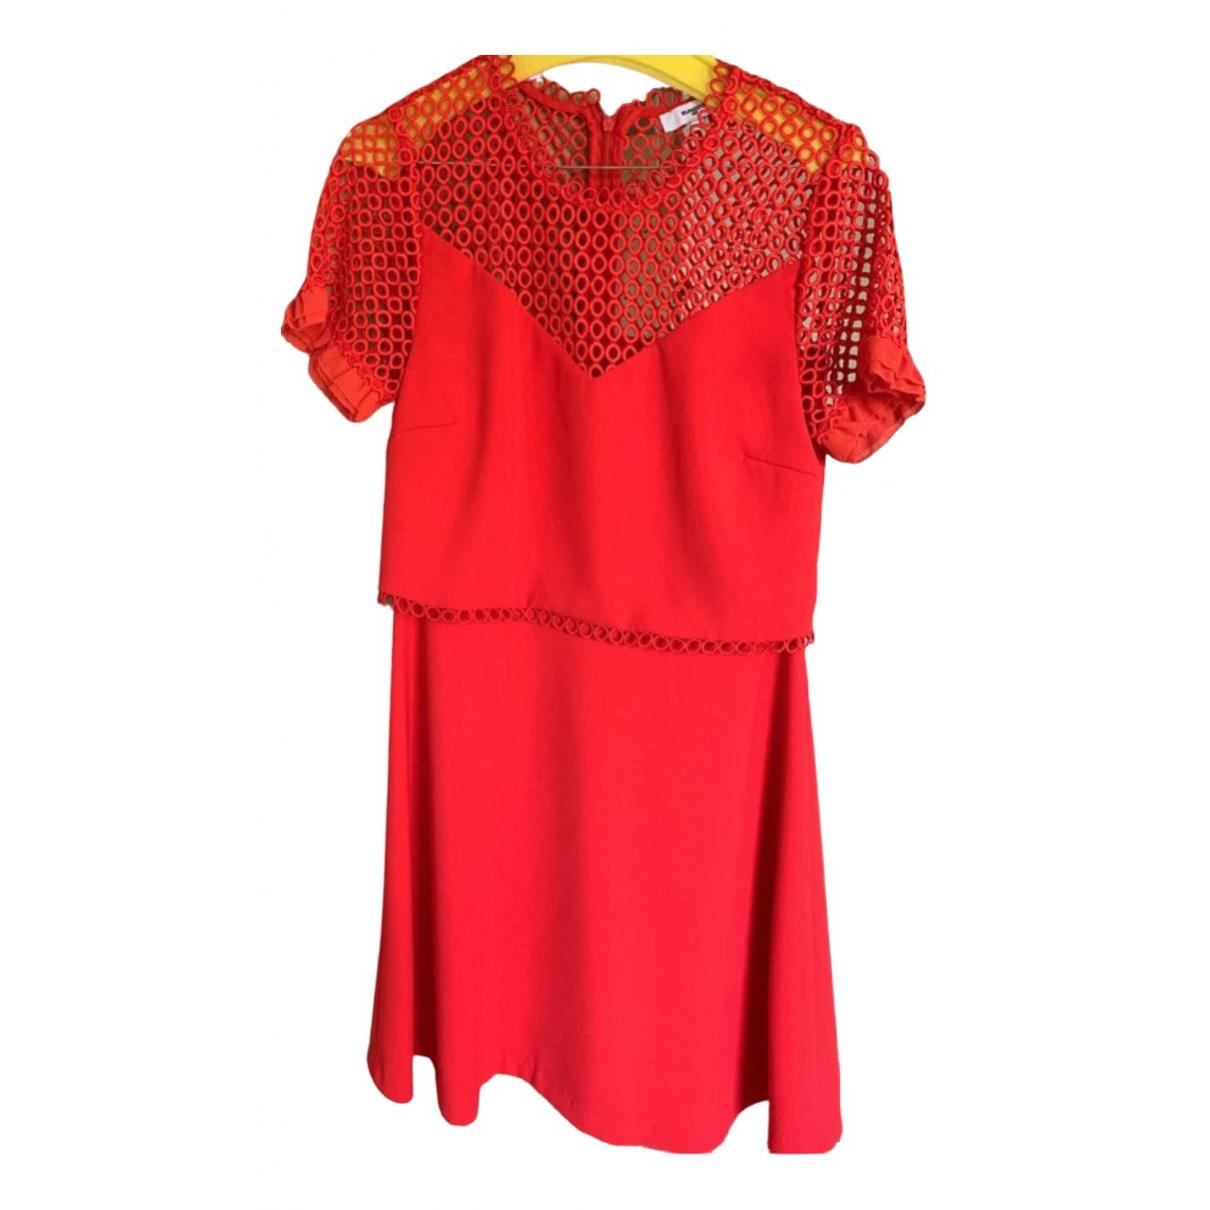 Suncoo \N Red dress for Women 34 FR